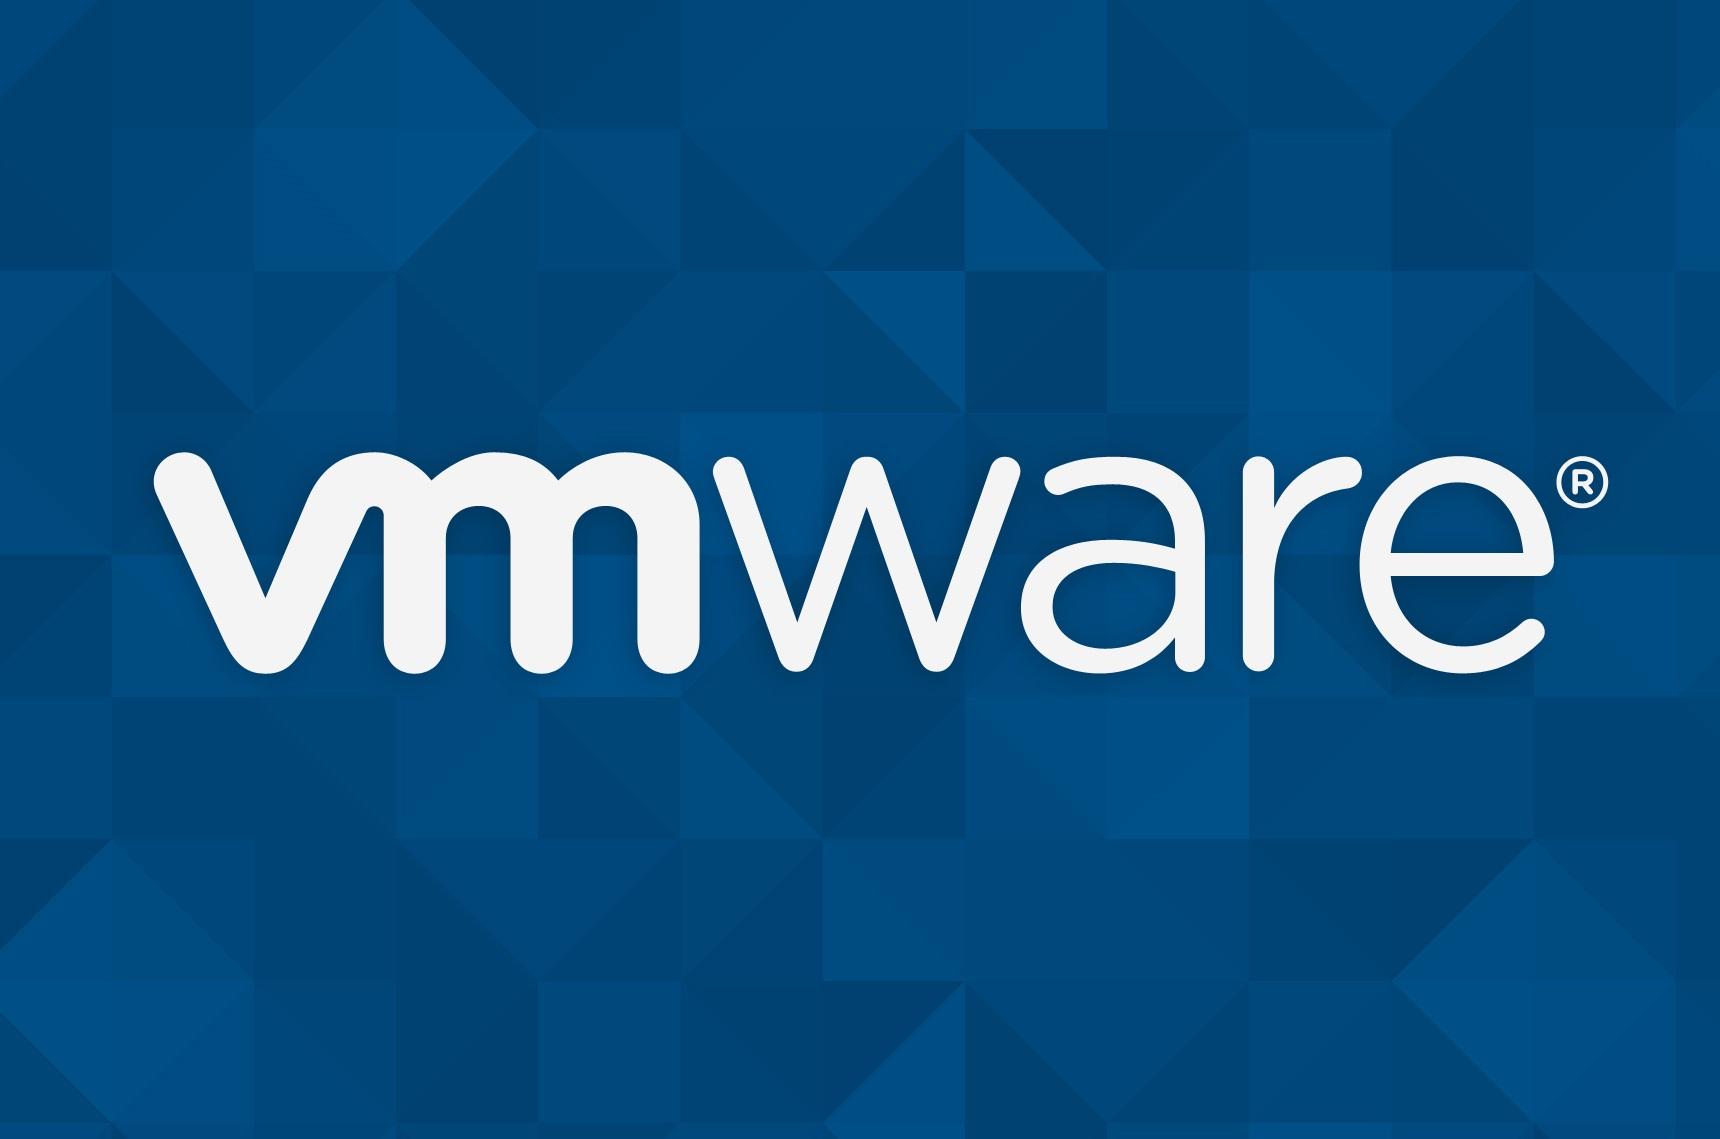 vmware-flings-guide-for-techies